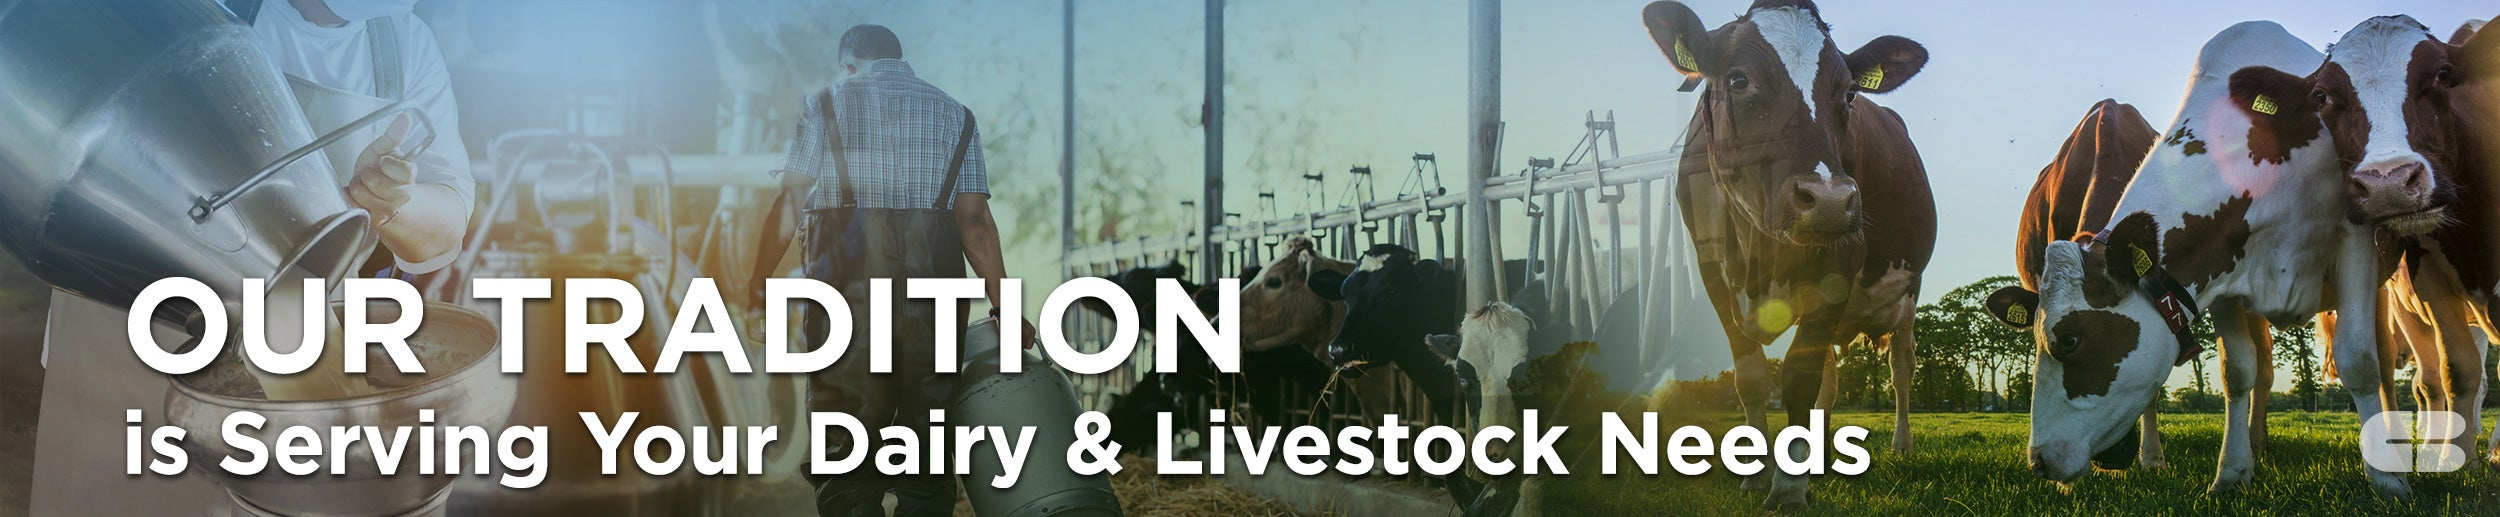 dairy and livestock